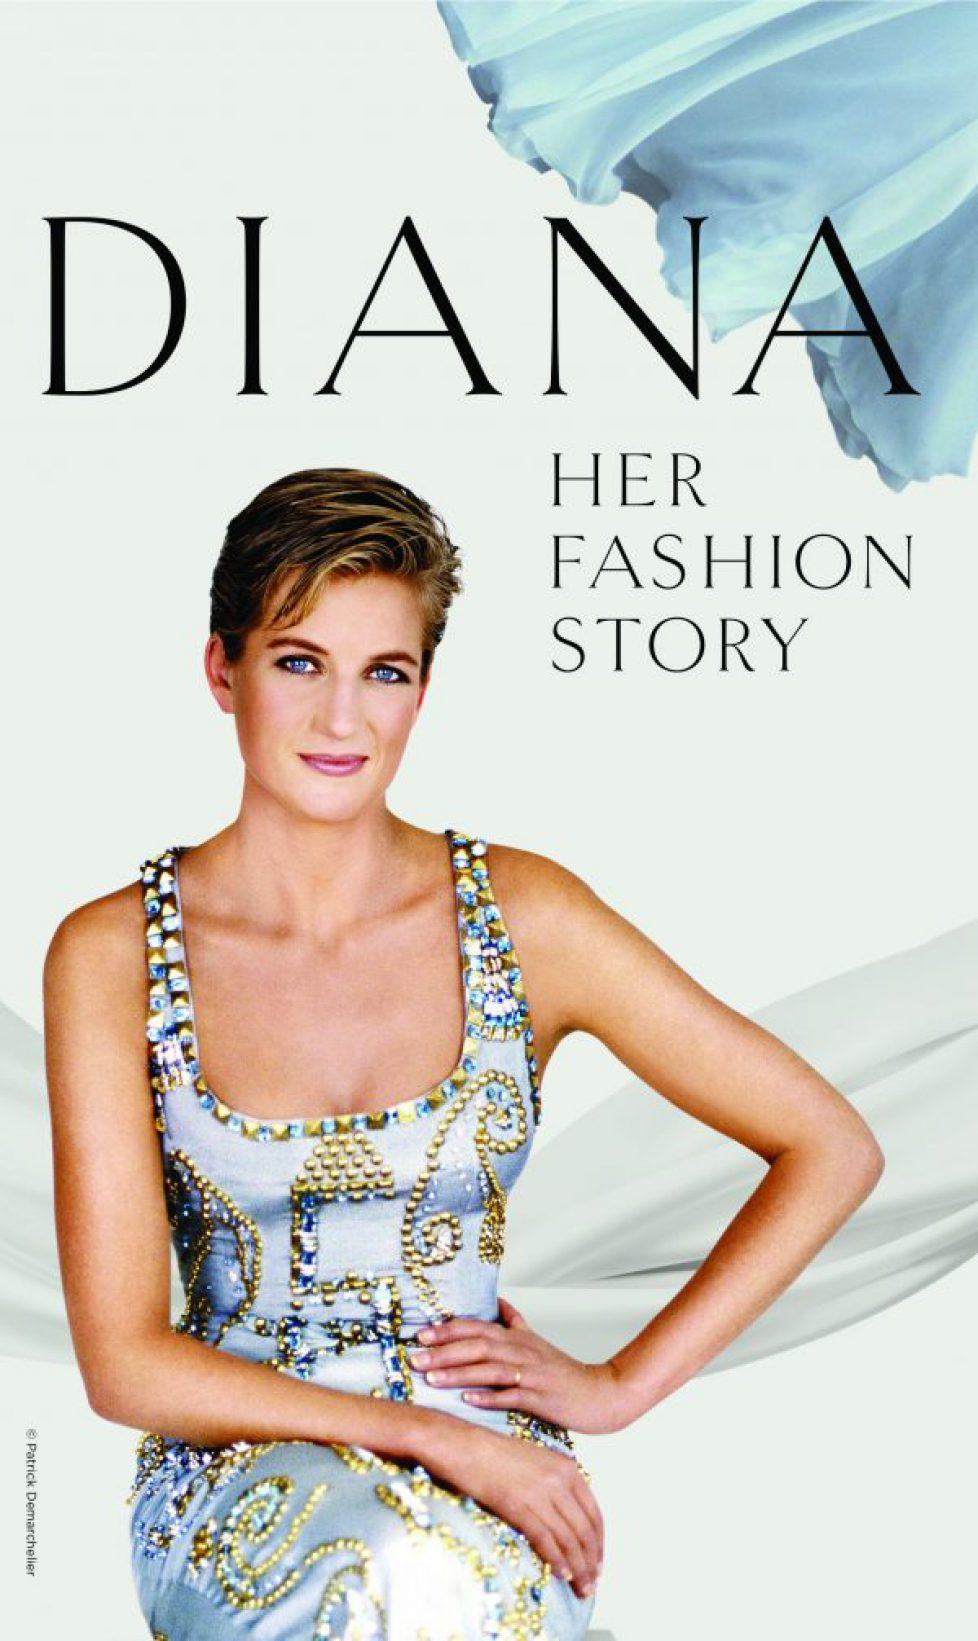 Diana-Her-Fashion-Story-creative-600x1007